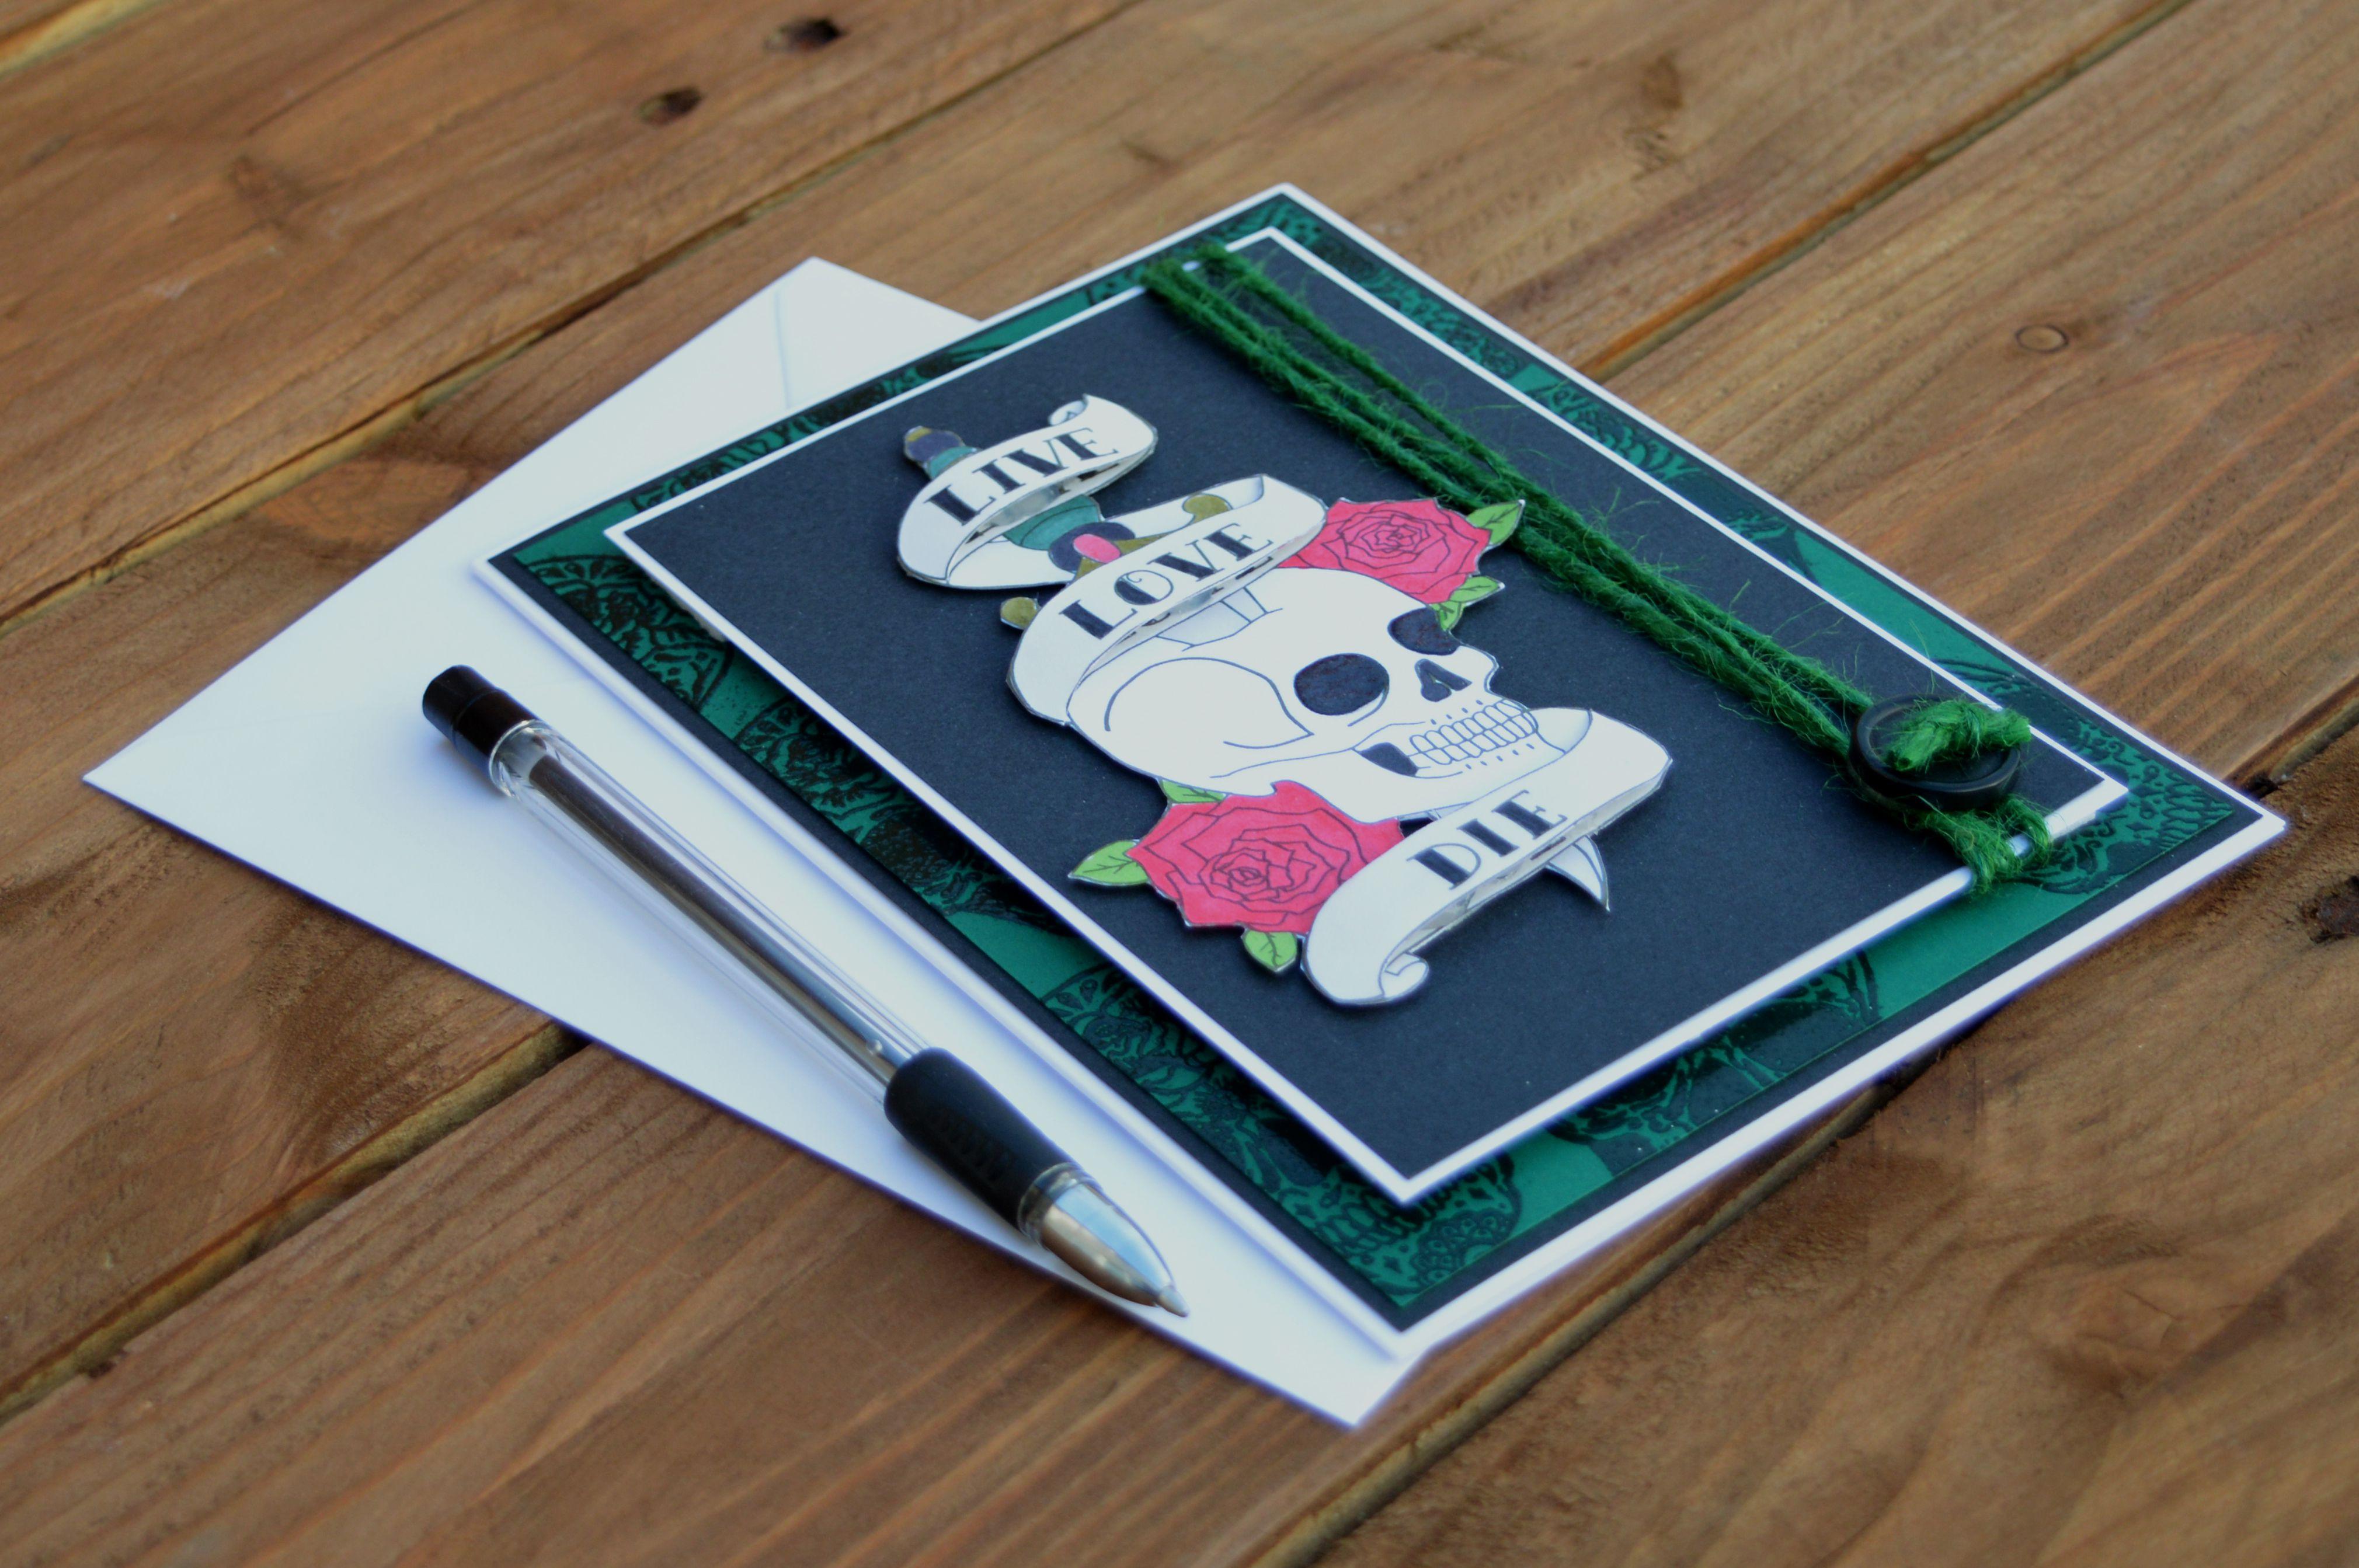 birthday card roses birthdaycard gift greetings green skull papercraft handmade dagger tattoo art